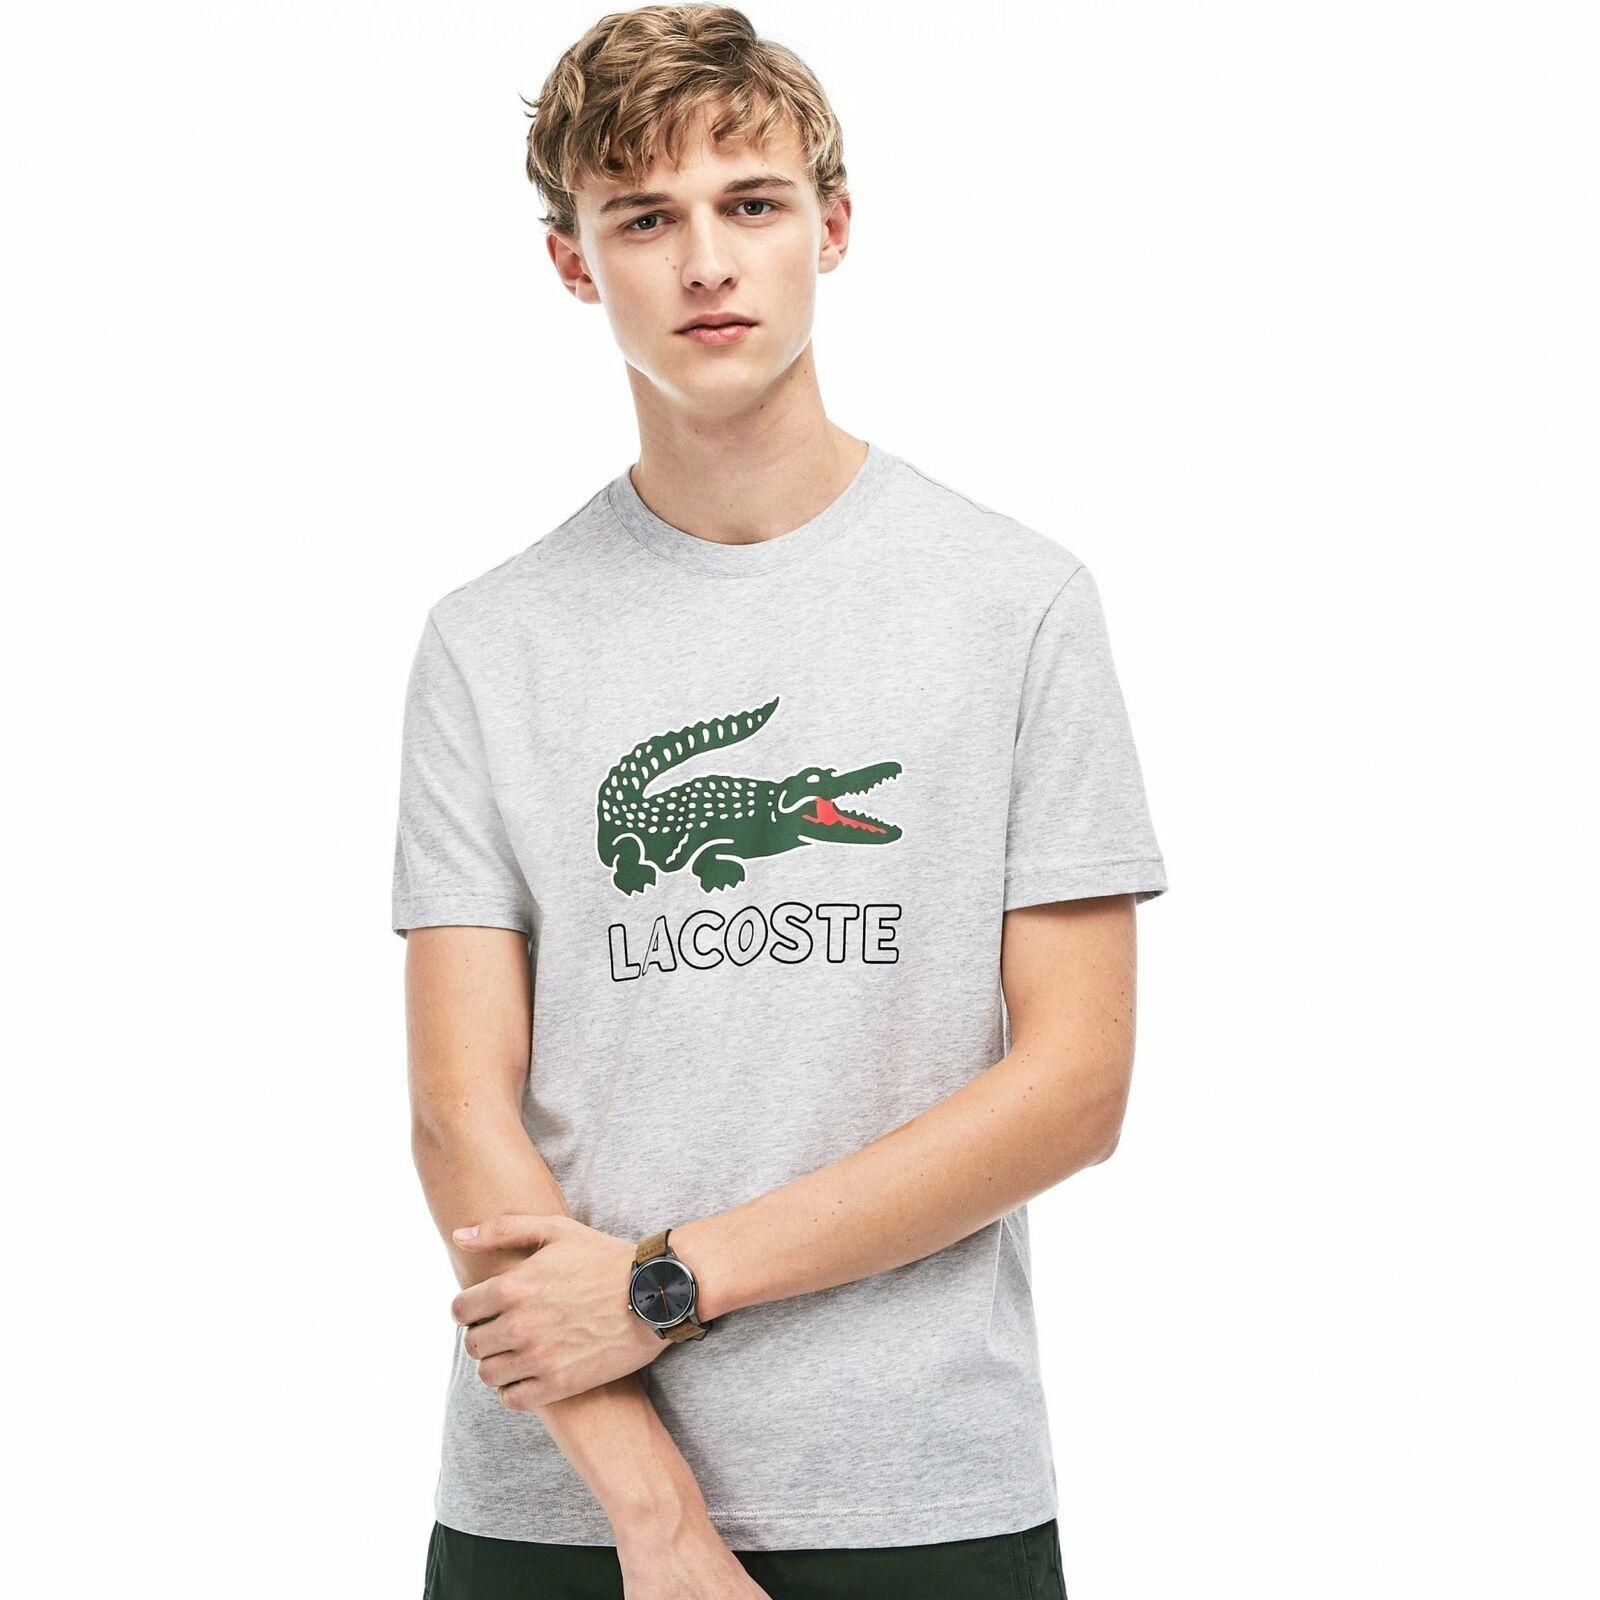 Lacoste Mens Large Crocodile Print T-Shirt (Grey)